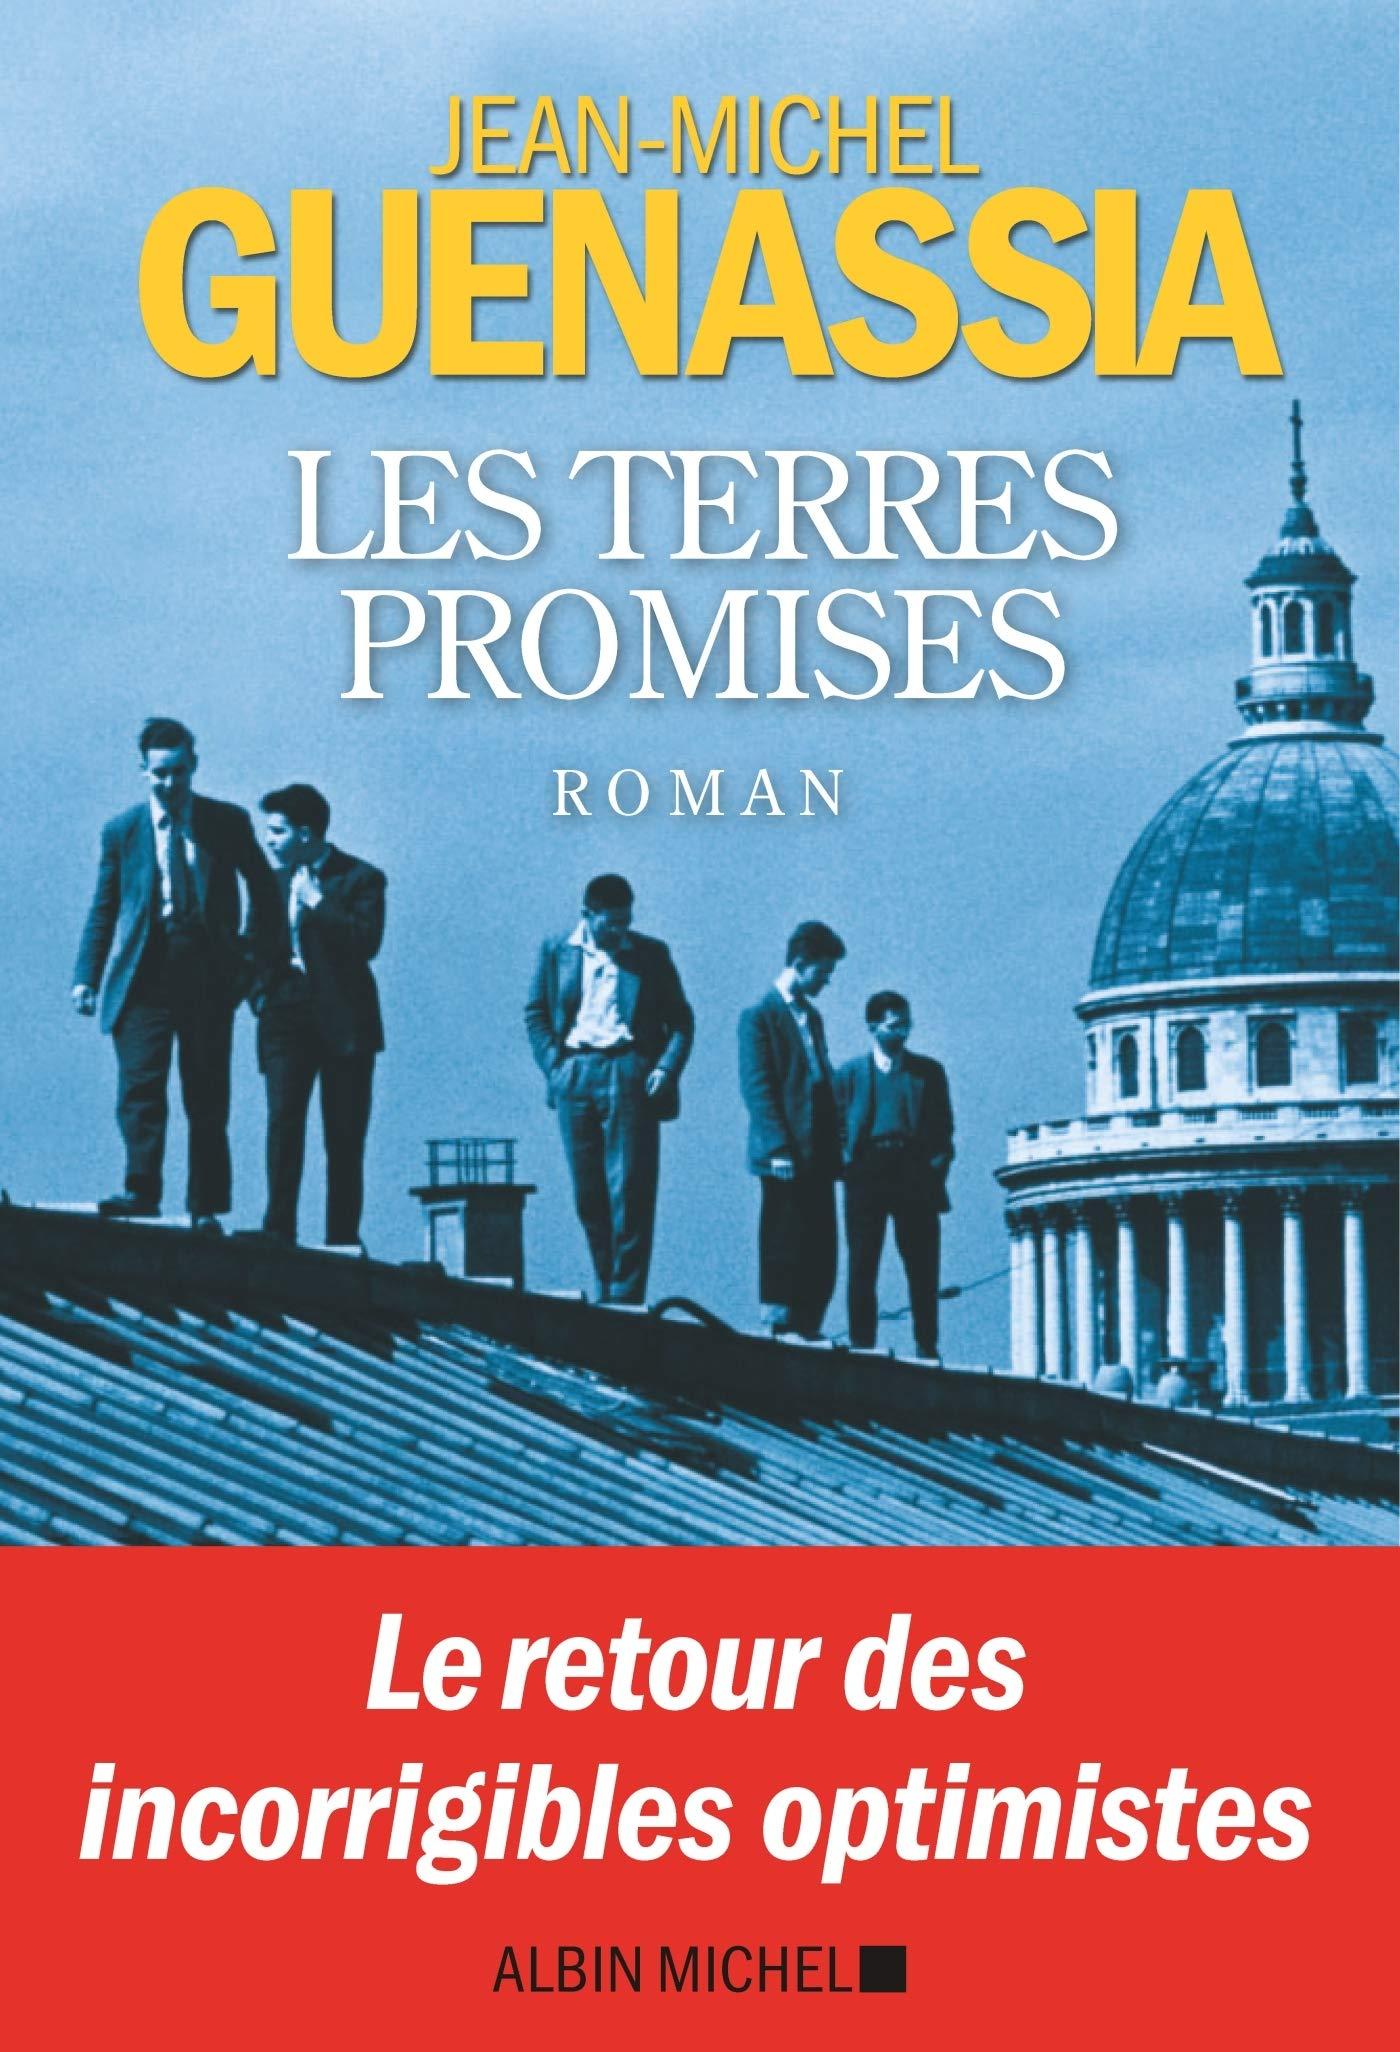 Amazon.fr - Les Terres promises - Guenassia, Jean-Michel - Livres